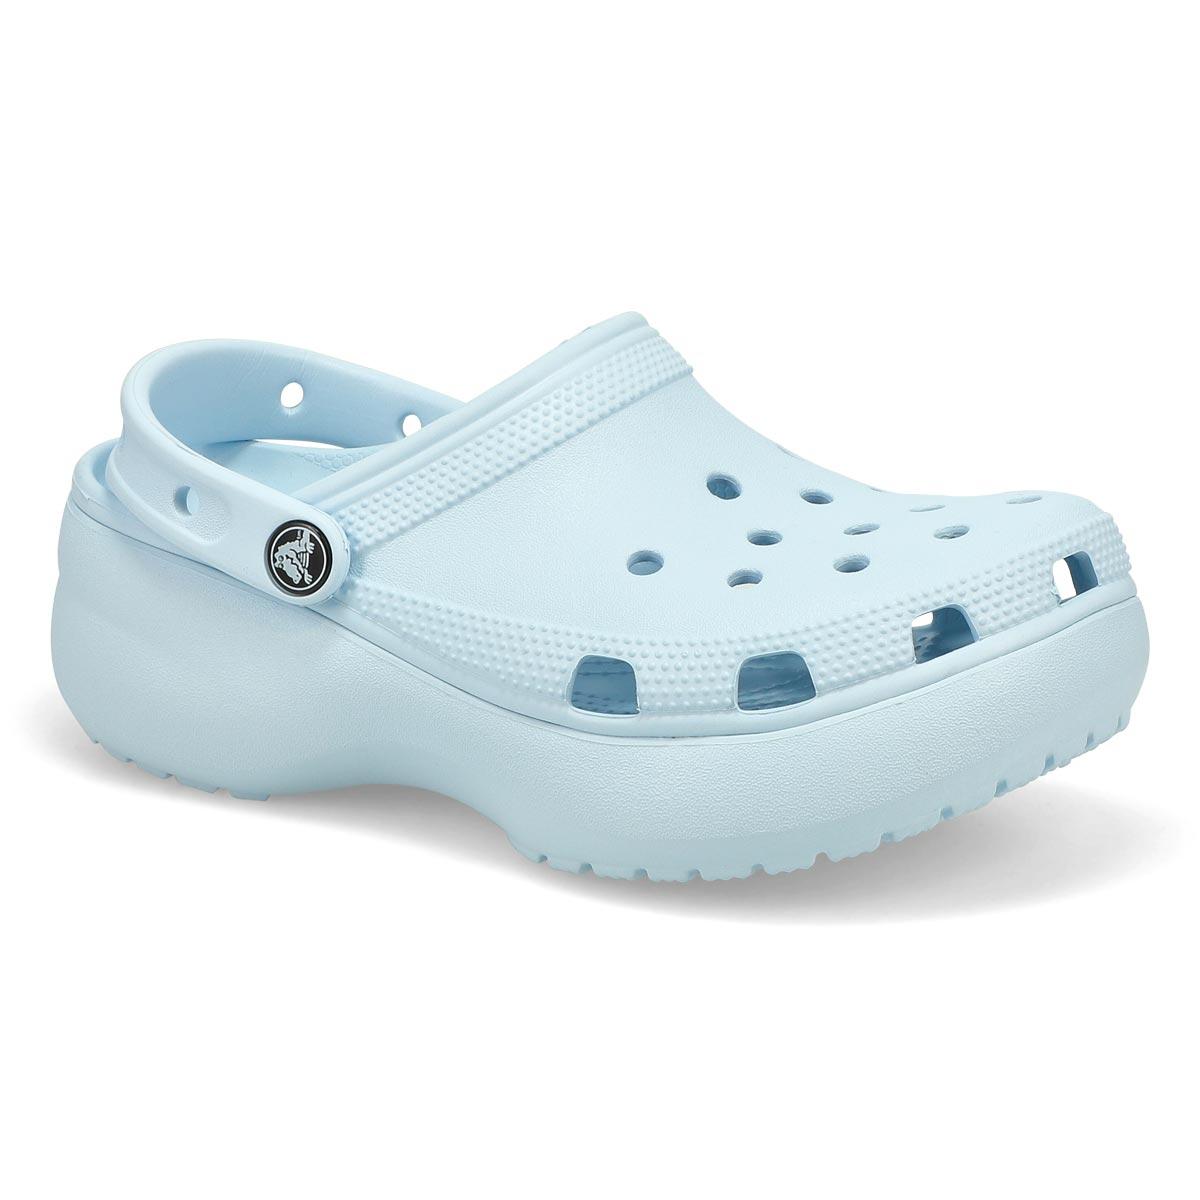 Women's Classic Platform EVA Clog- Mineral Blue